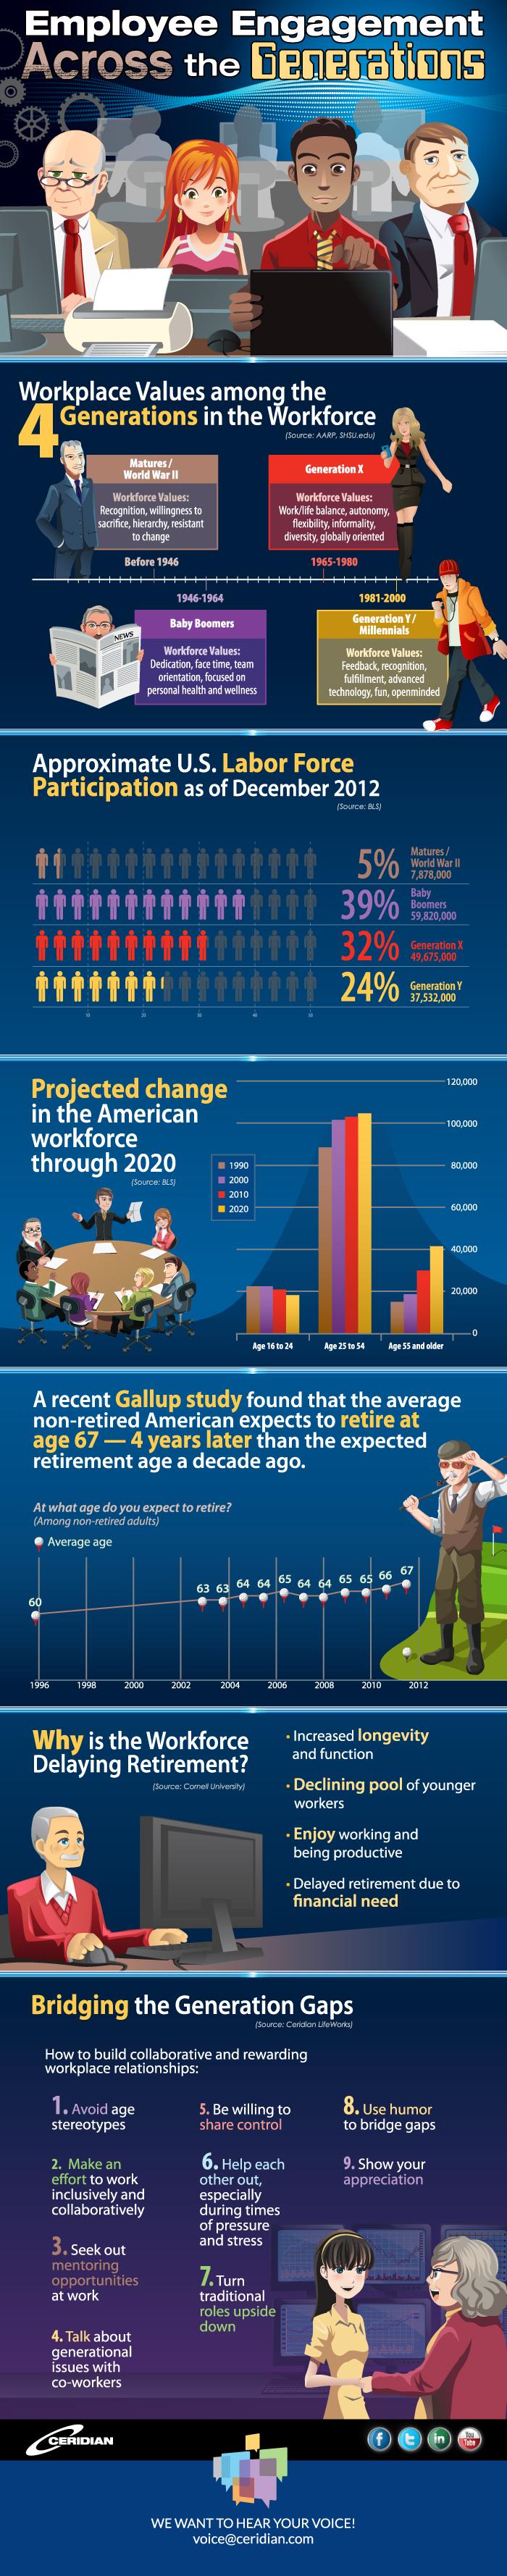 Employee Engagement info